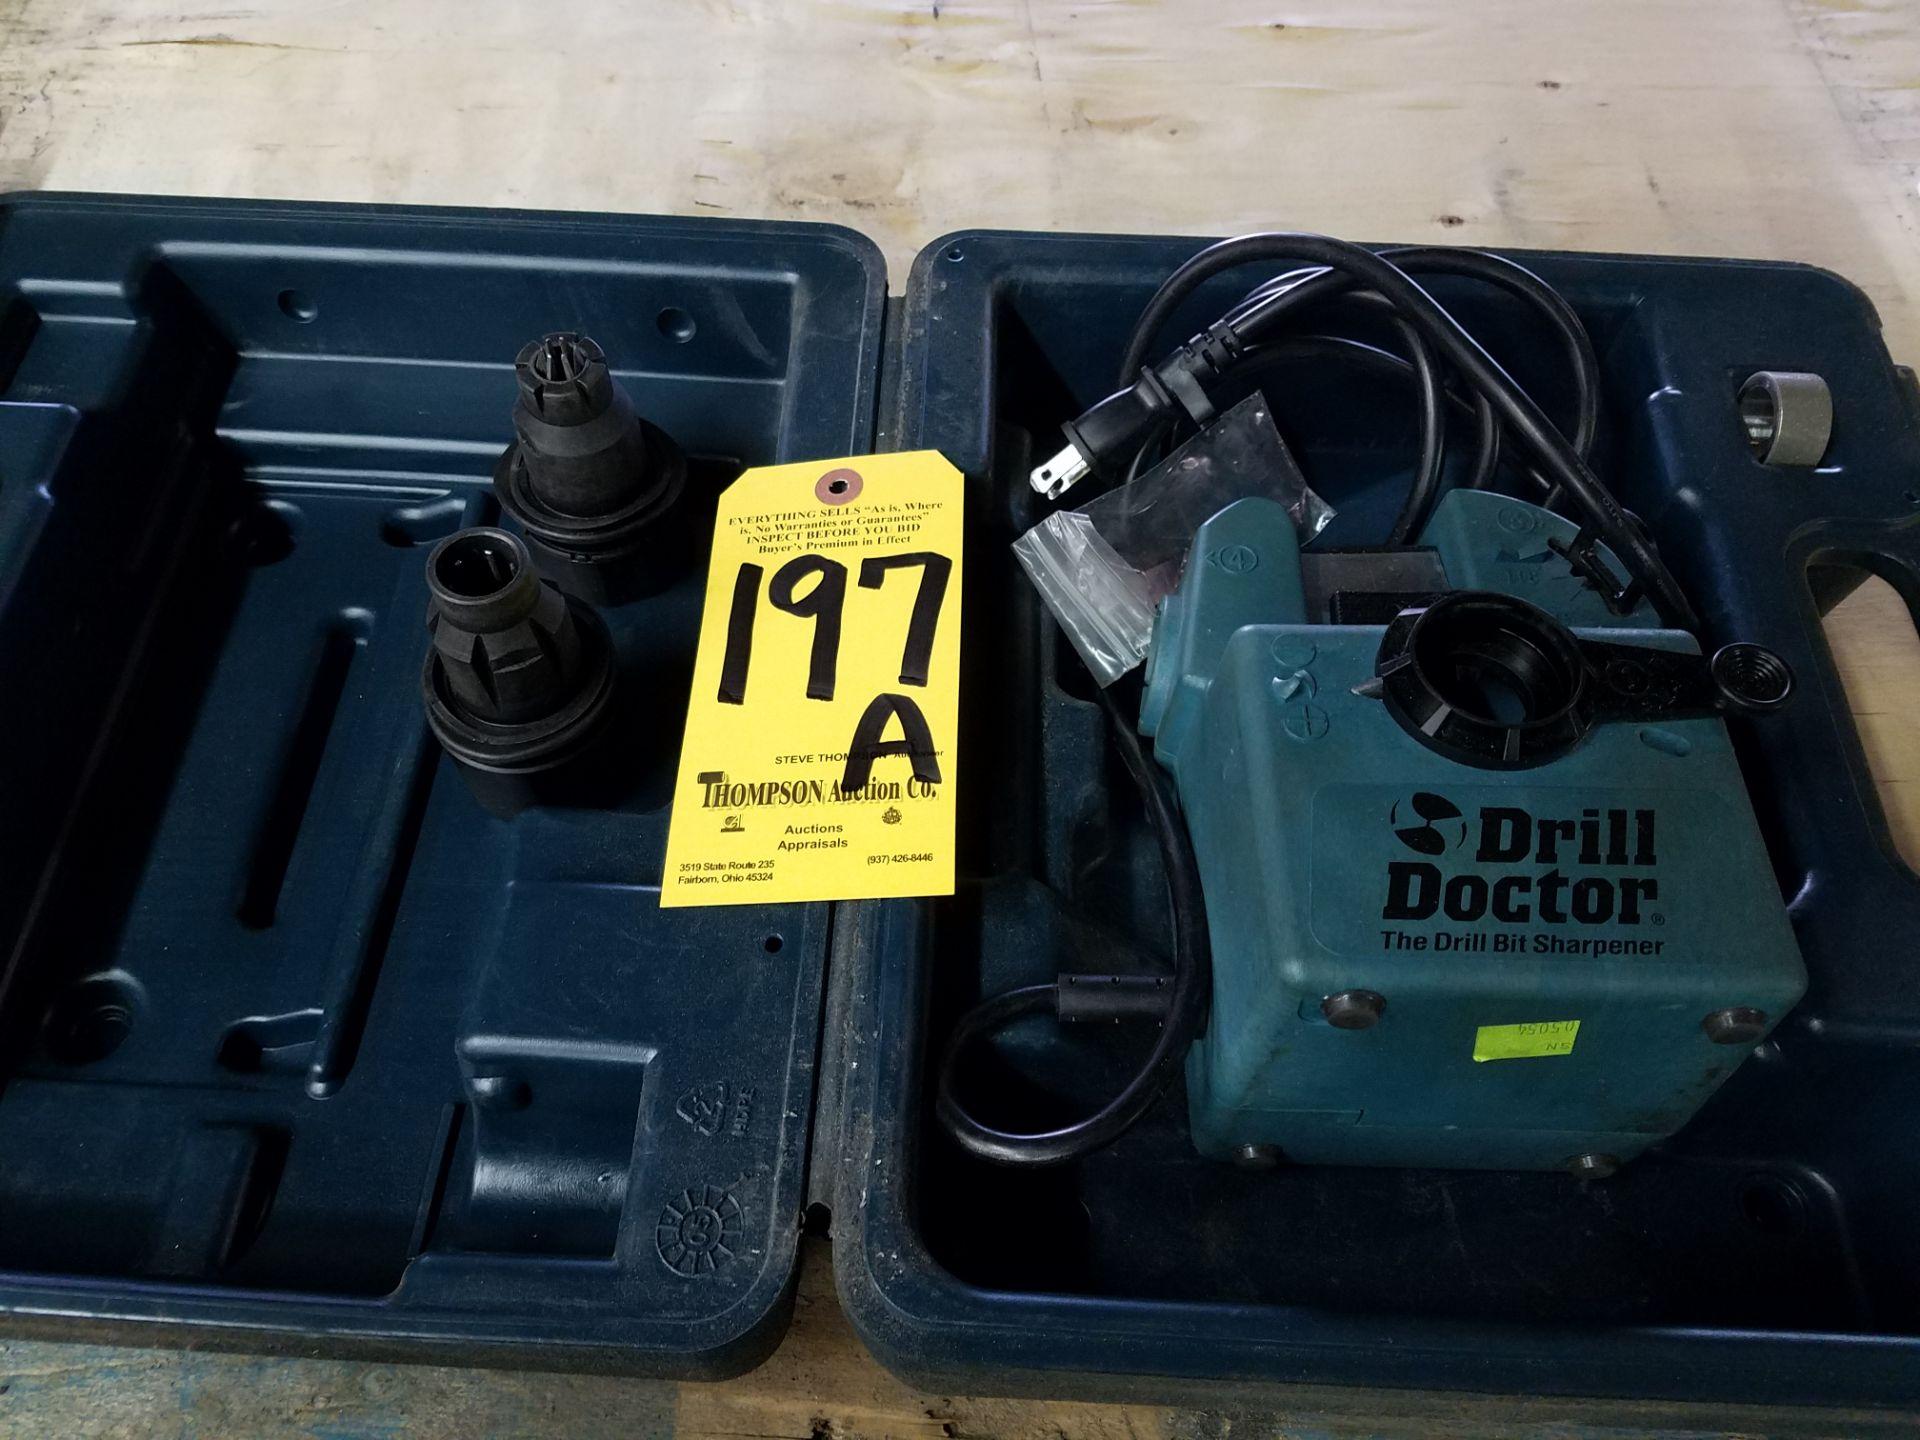 Lot 197A - Drill Doctor Model 750 Drill Bit Sharpener